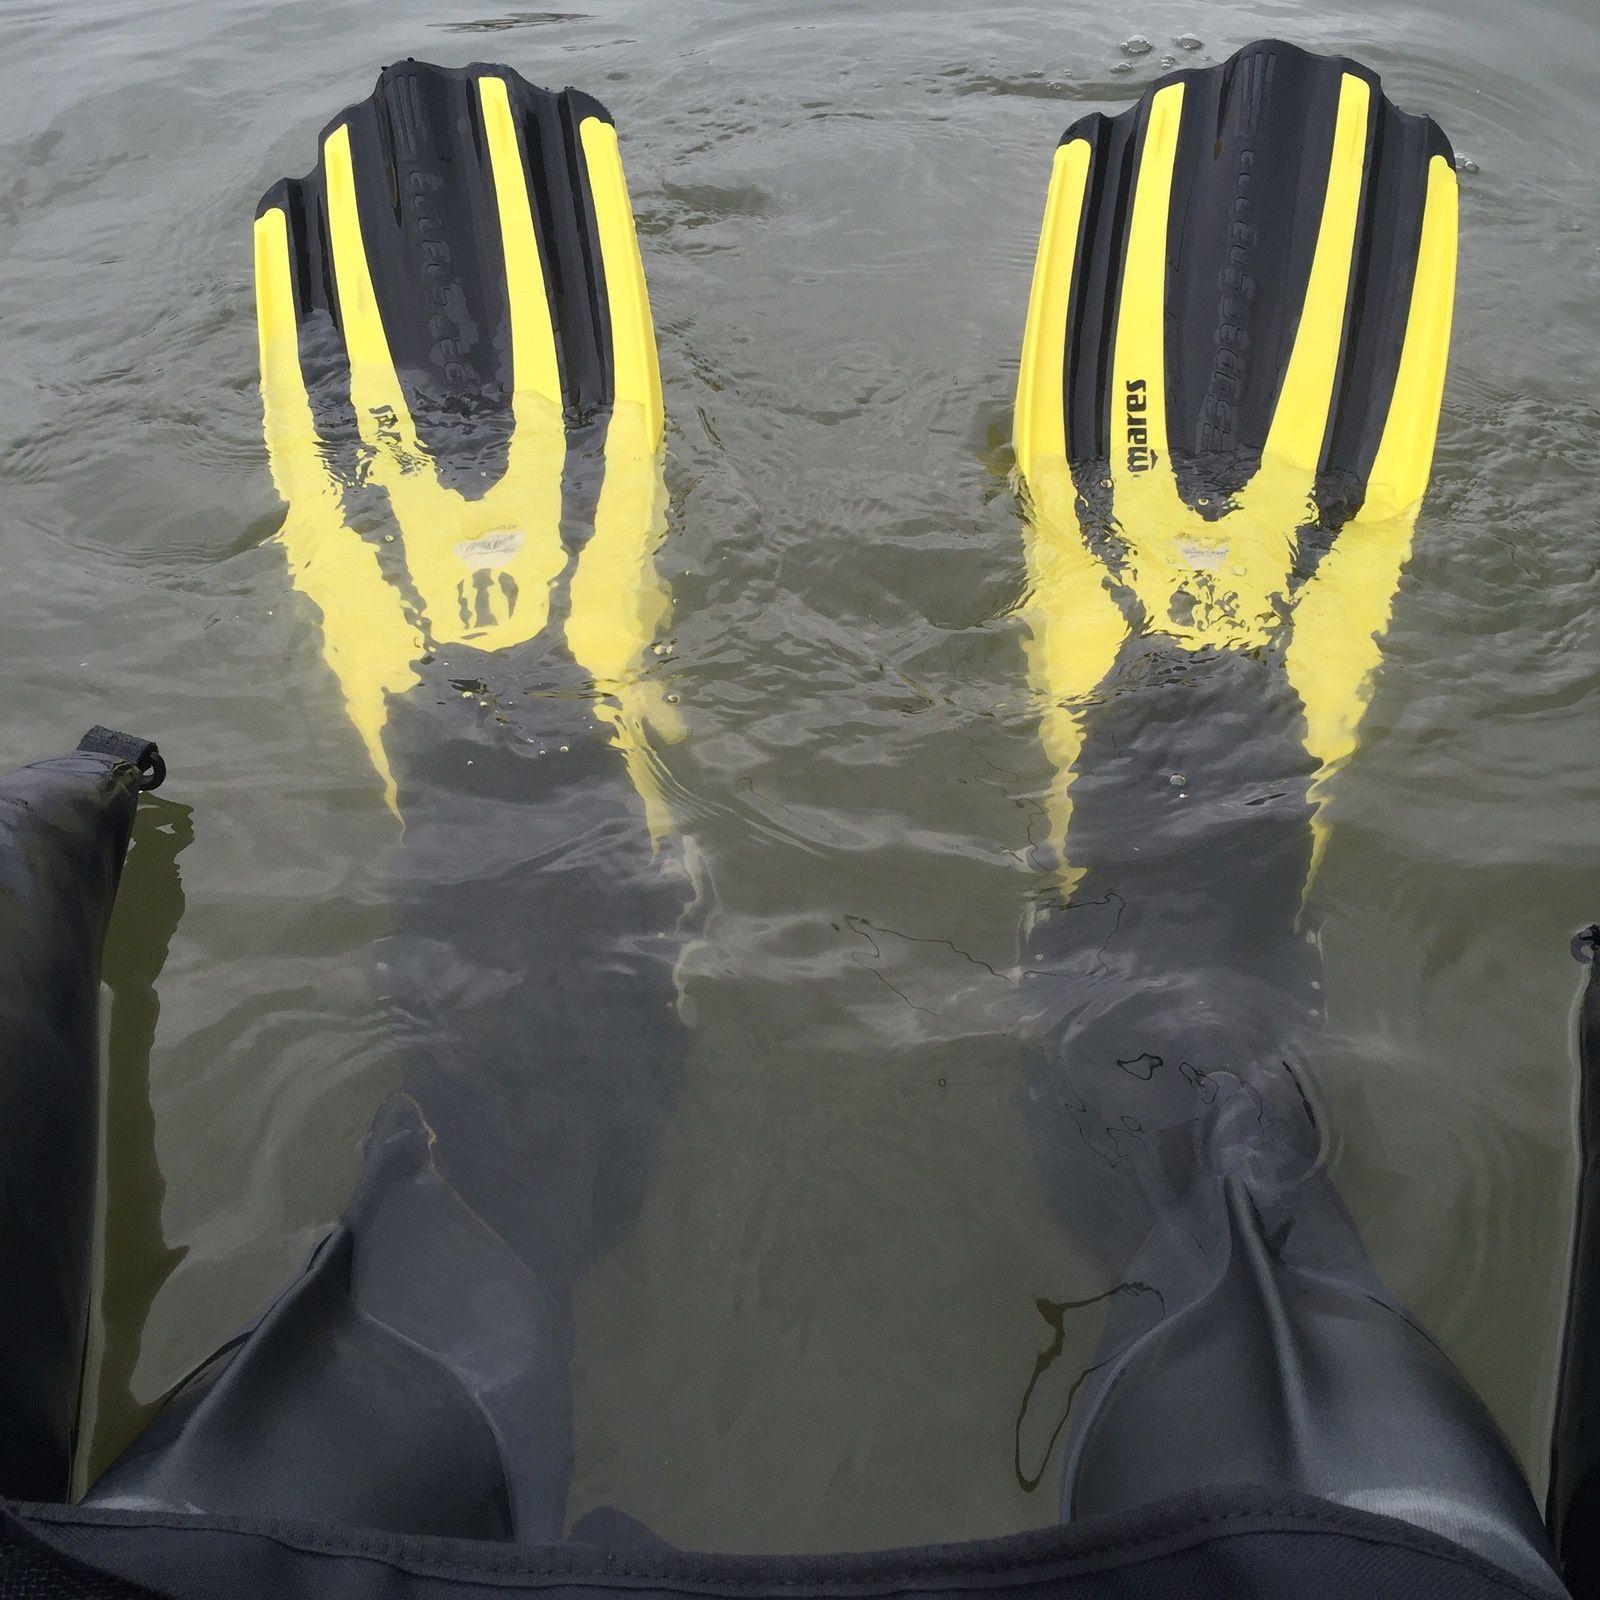 FLOAT-TUBE sandres perches